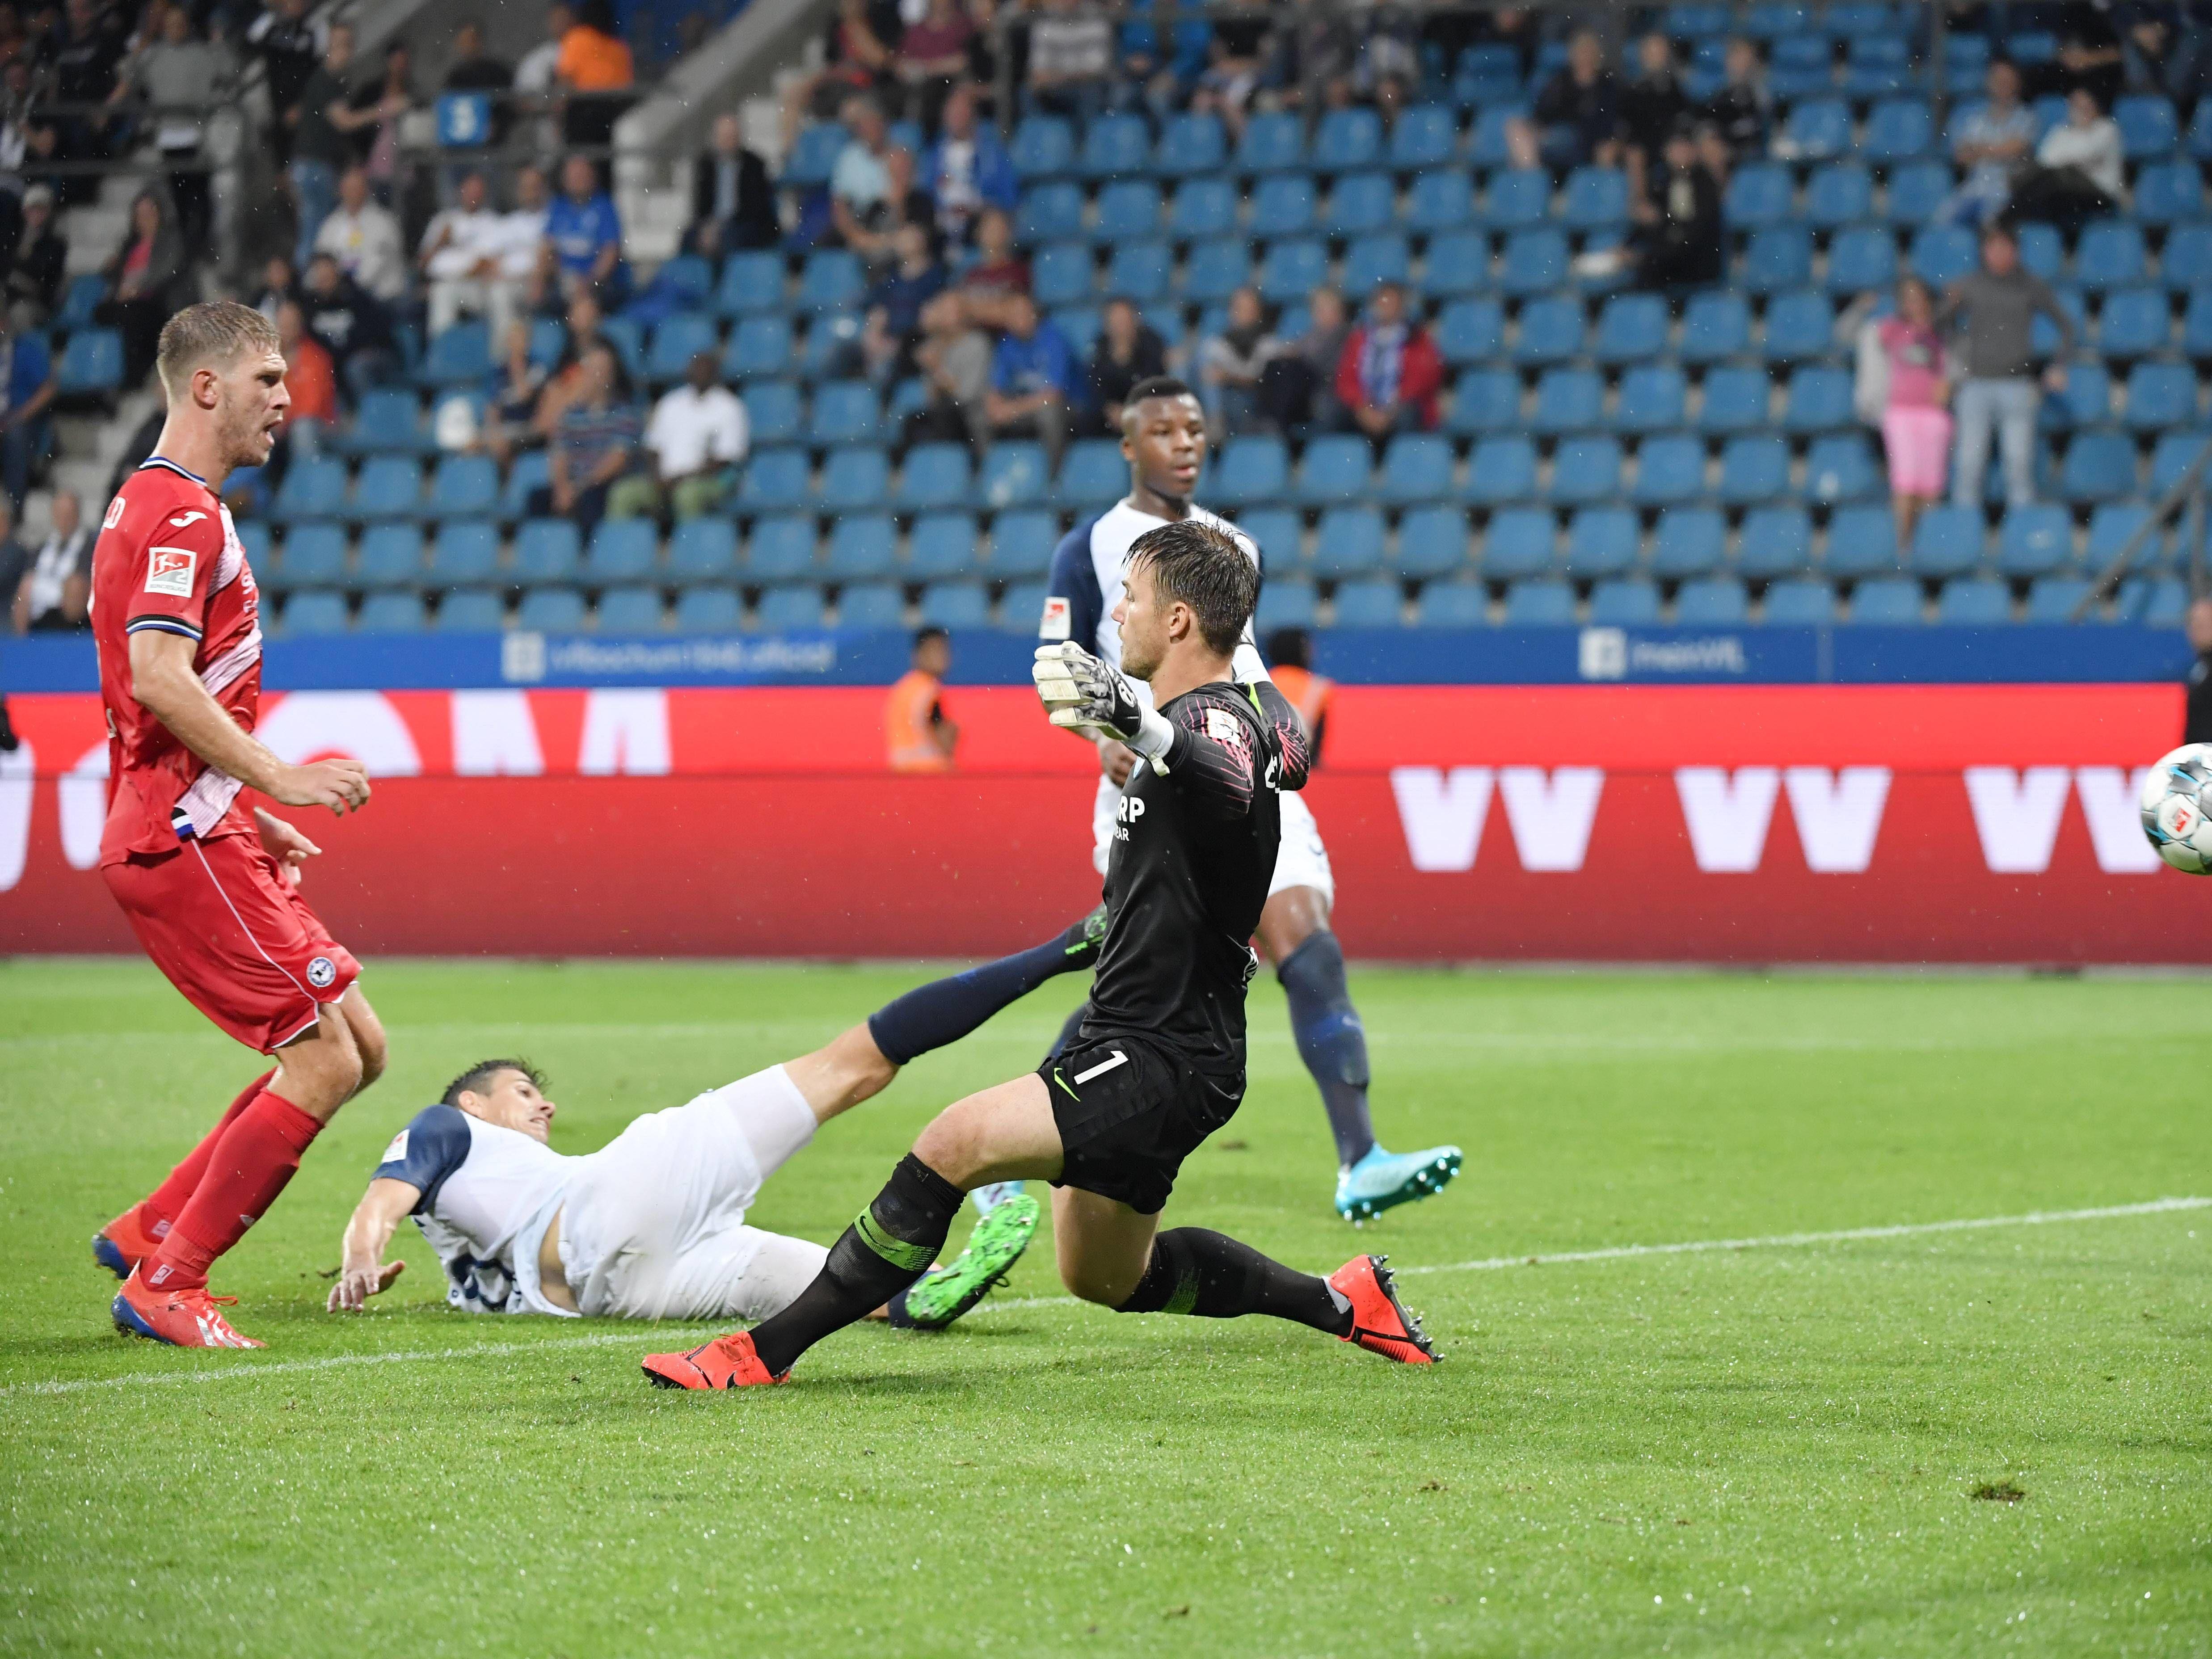 Hohes Tempo: Jonathan Clauss (links) zieht mit viel Speed an Bochums Danny Blum vorbei.